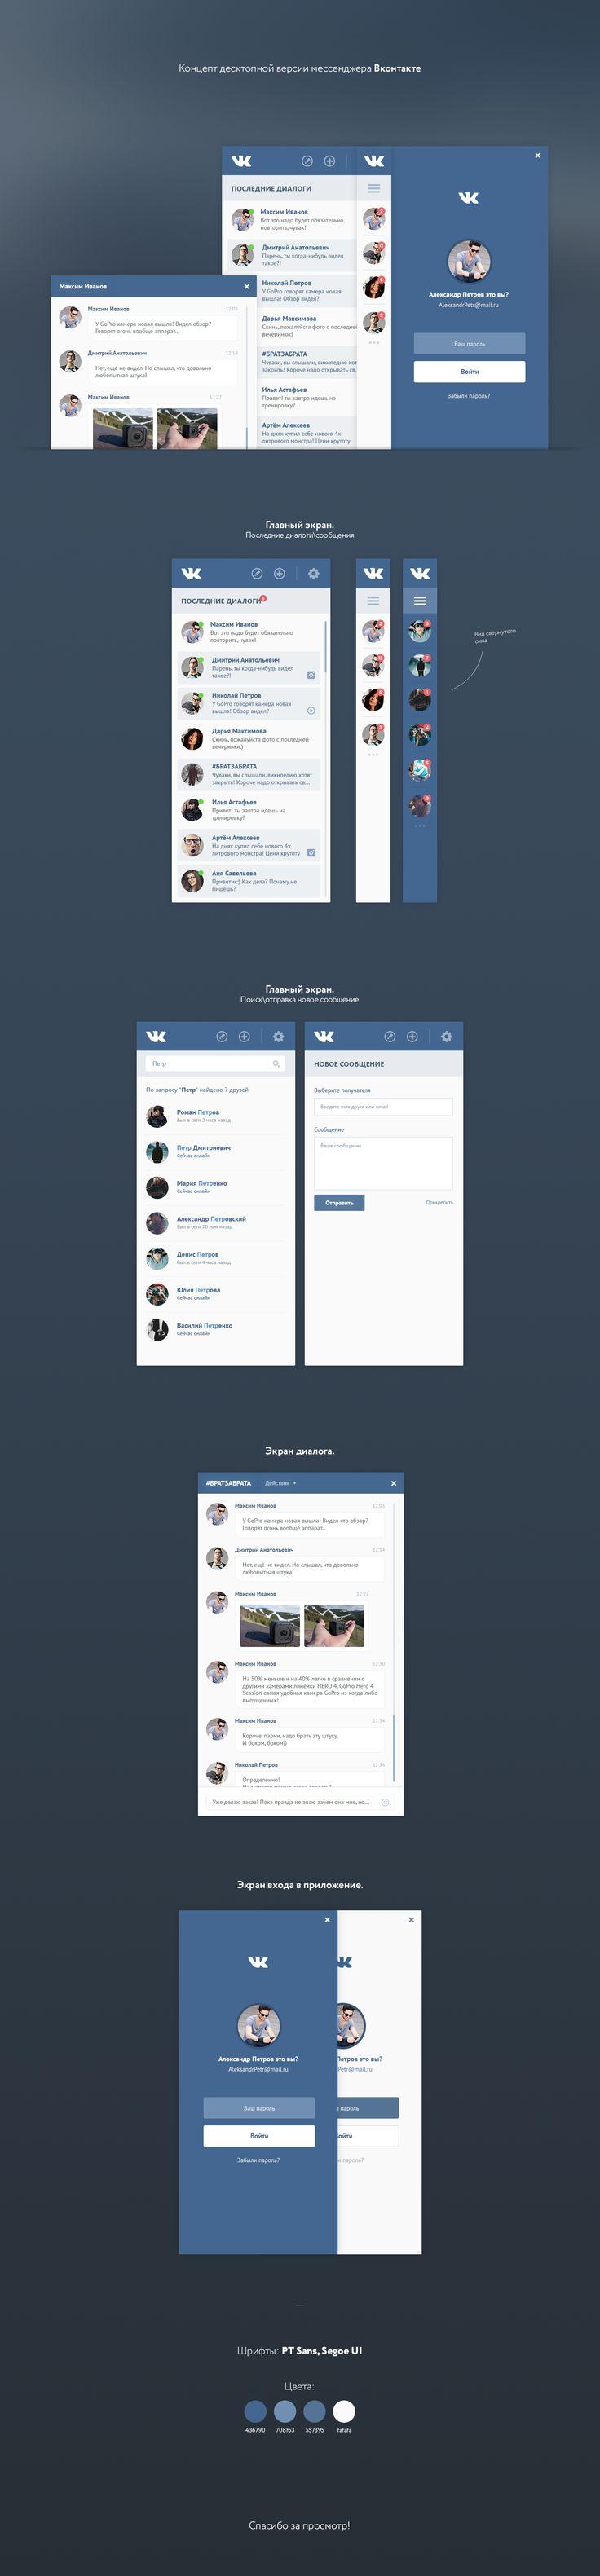 Messenger desktop application - Vk Desktop Messenger Concept Vol 2 On Behance